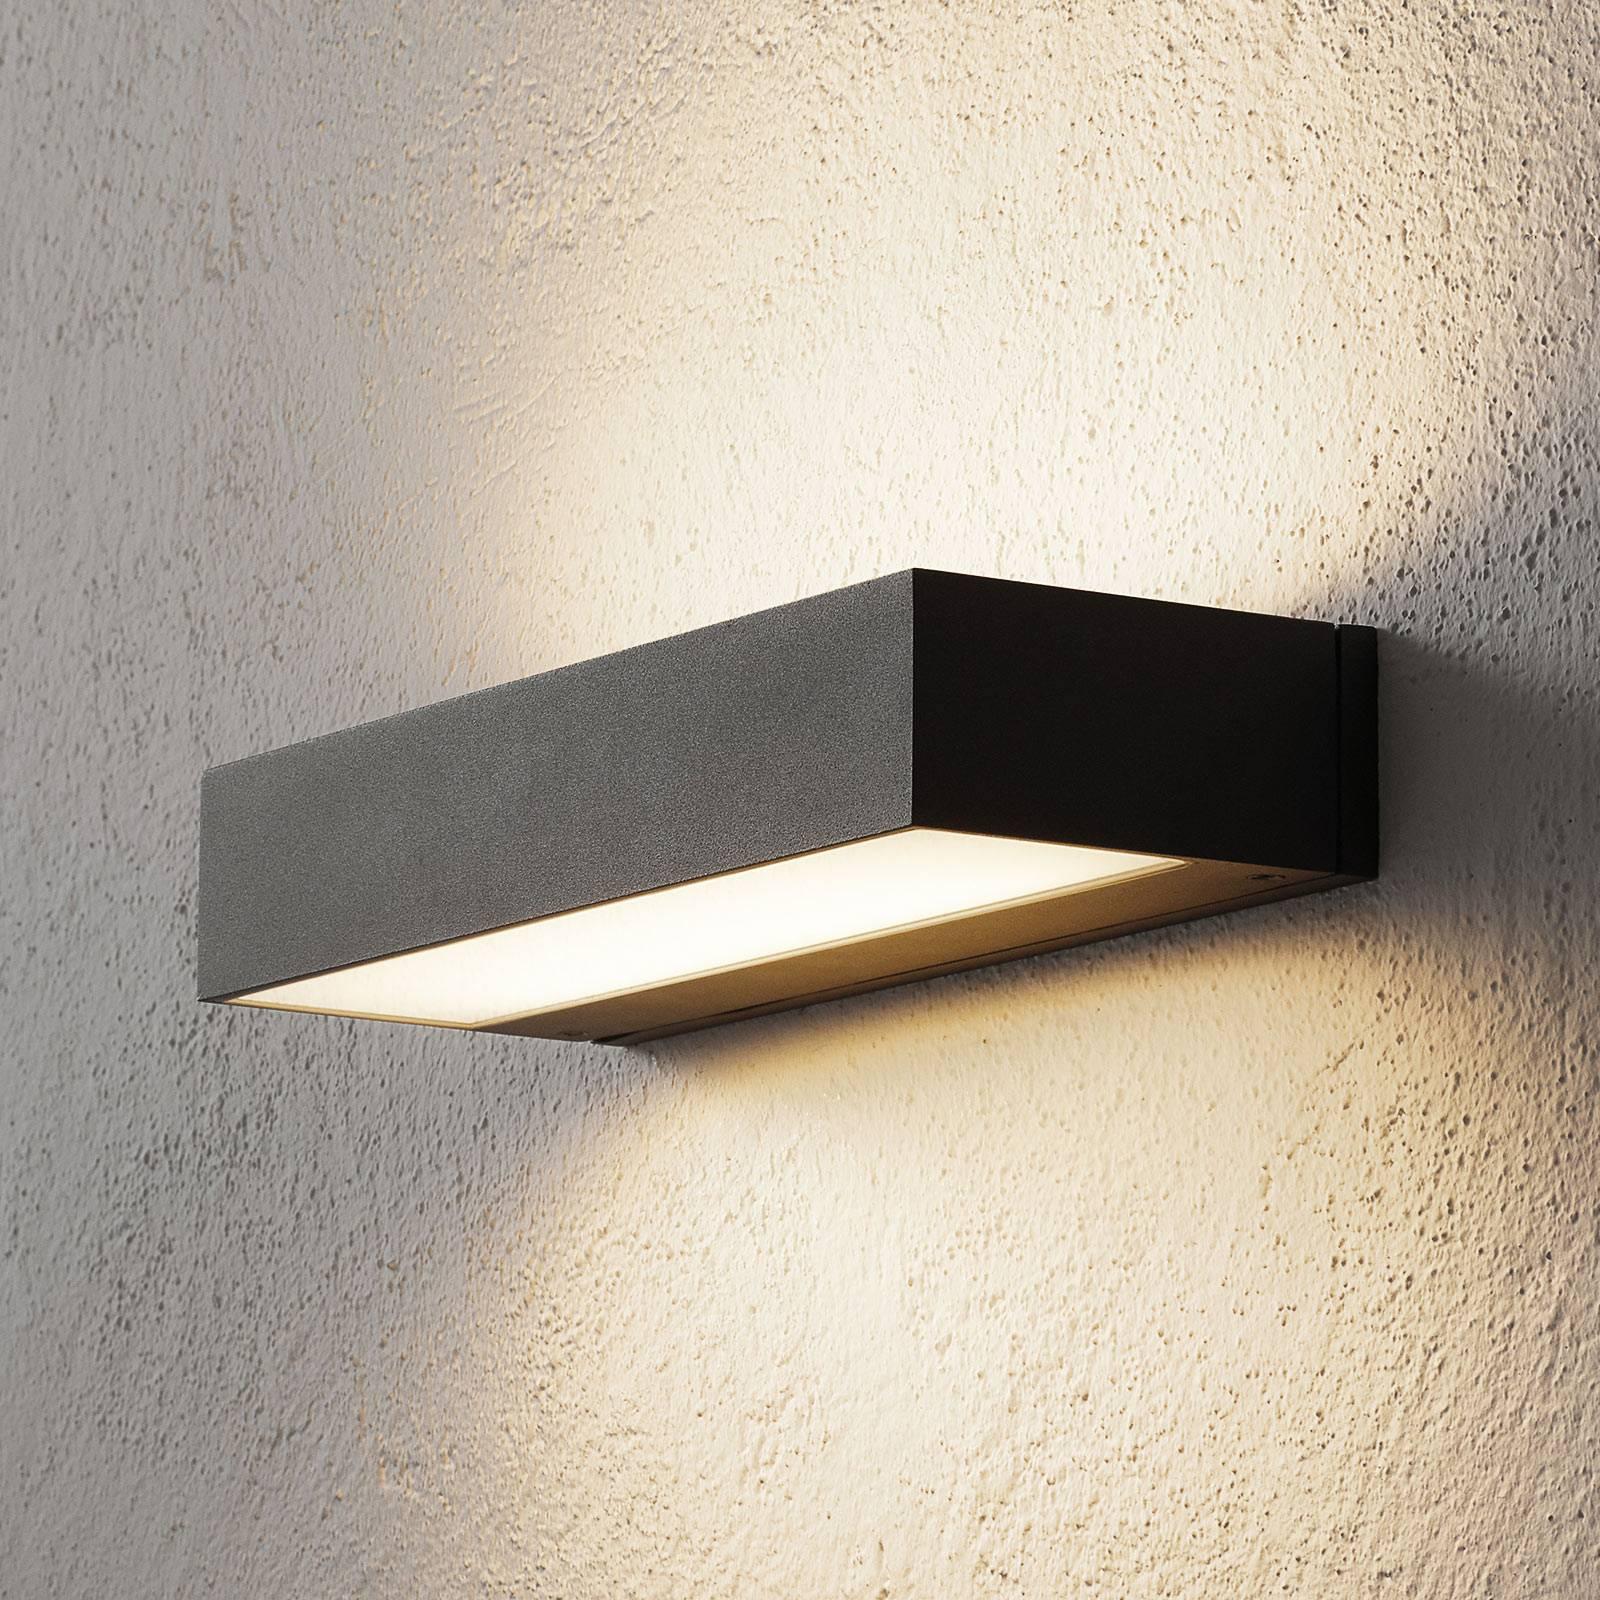 BEGA 33341 LED-seinälamppu 3000K 30cm up/downhopea